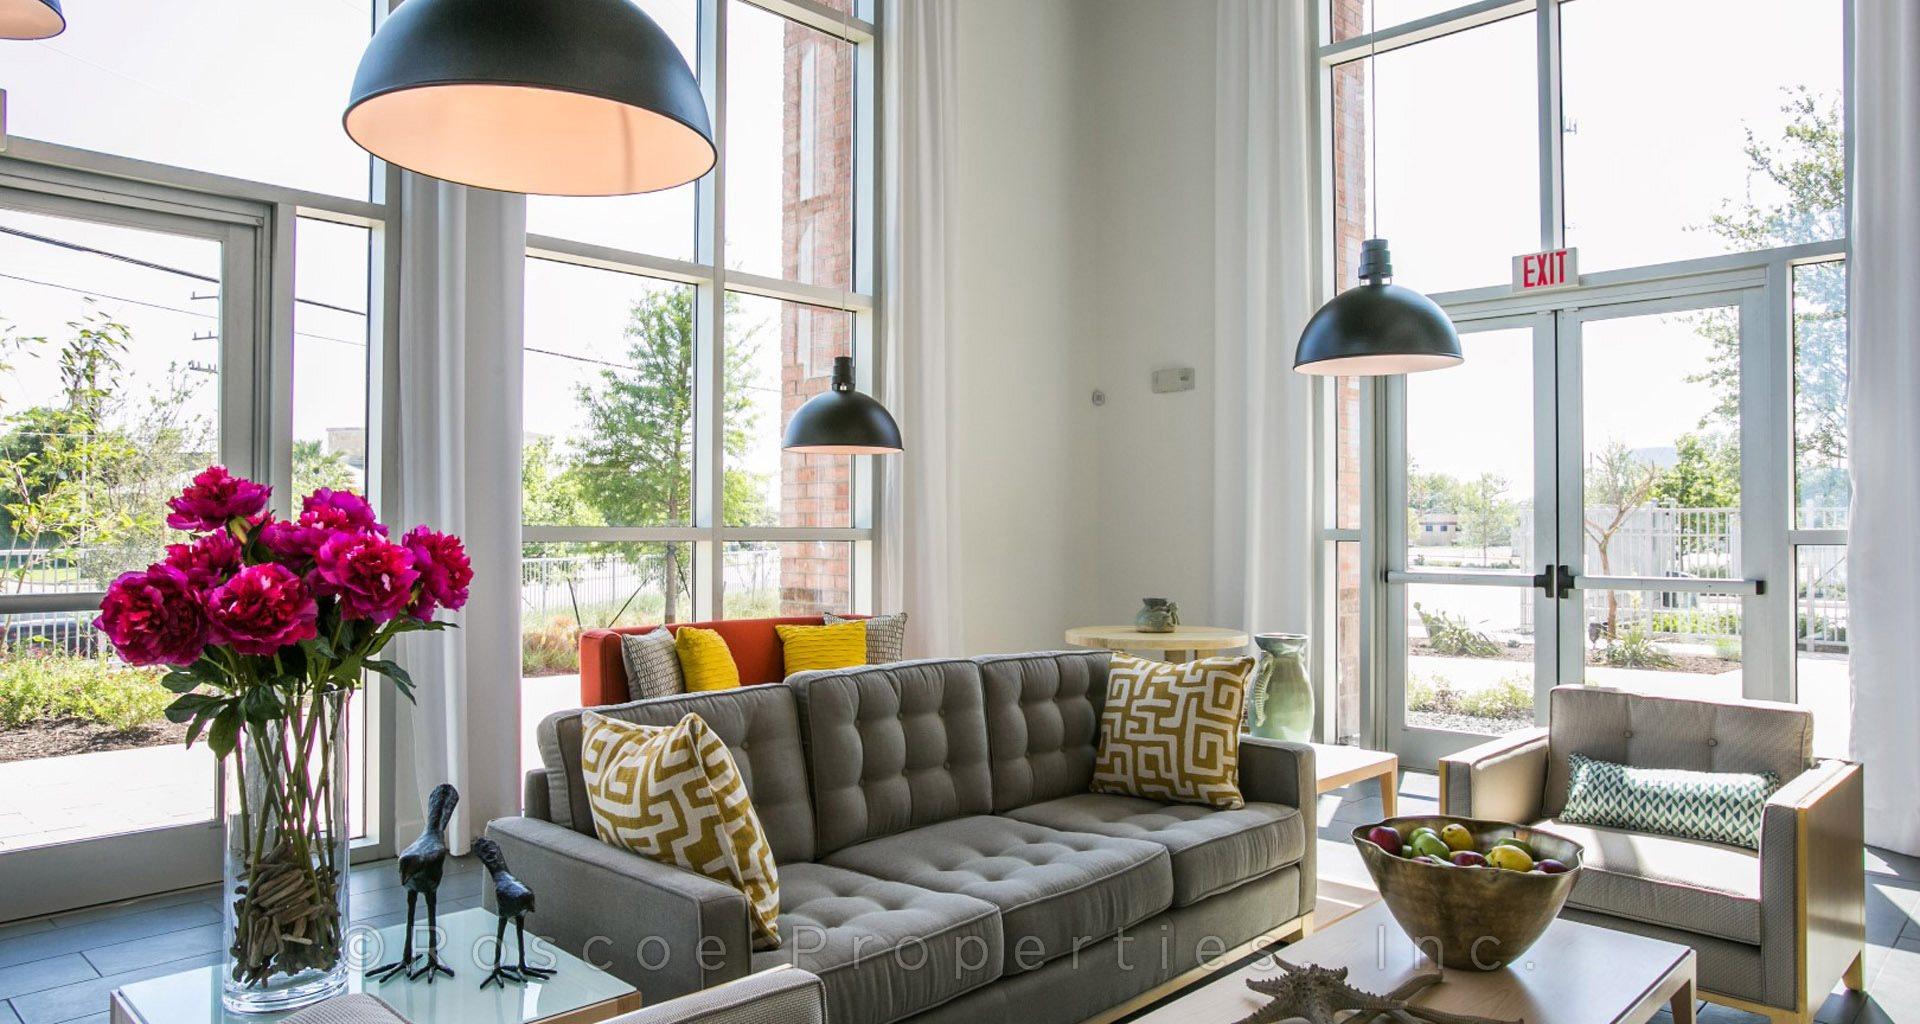 1111 Austin Highway Apartments in San Antonio living room